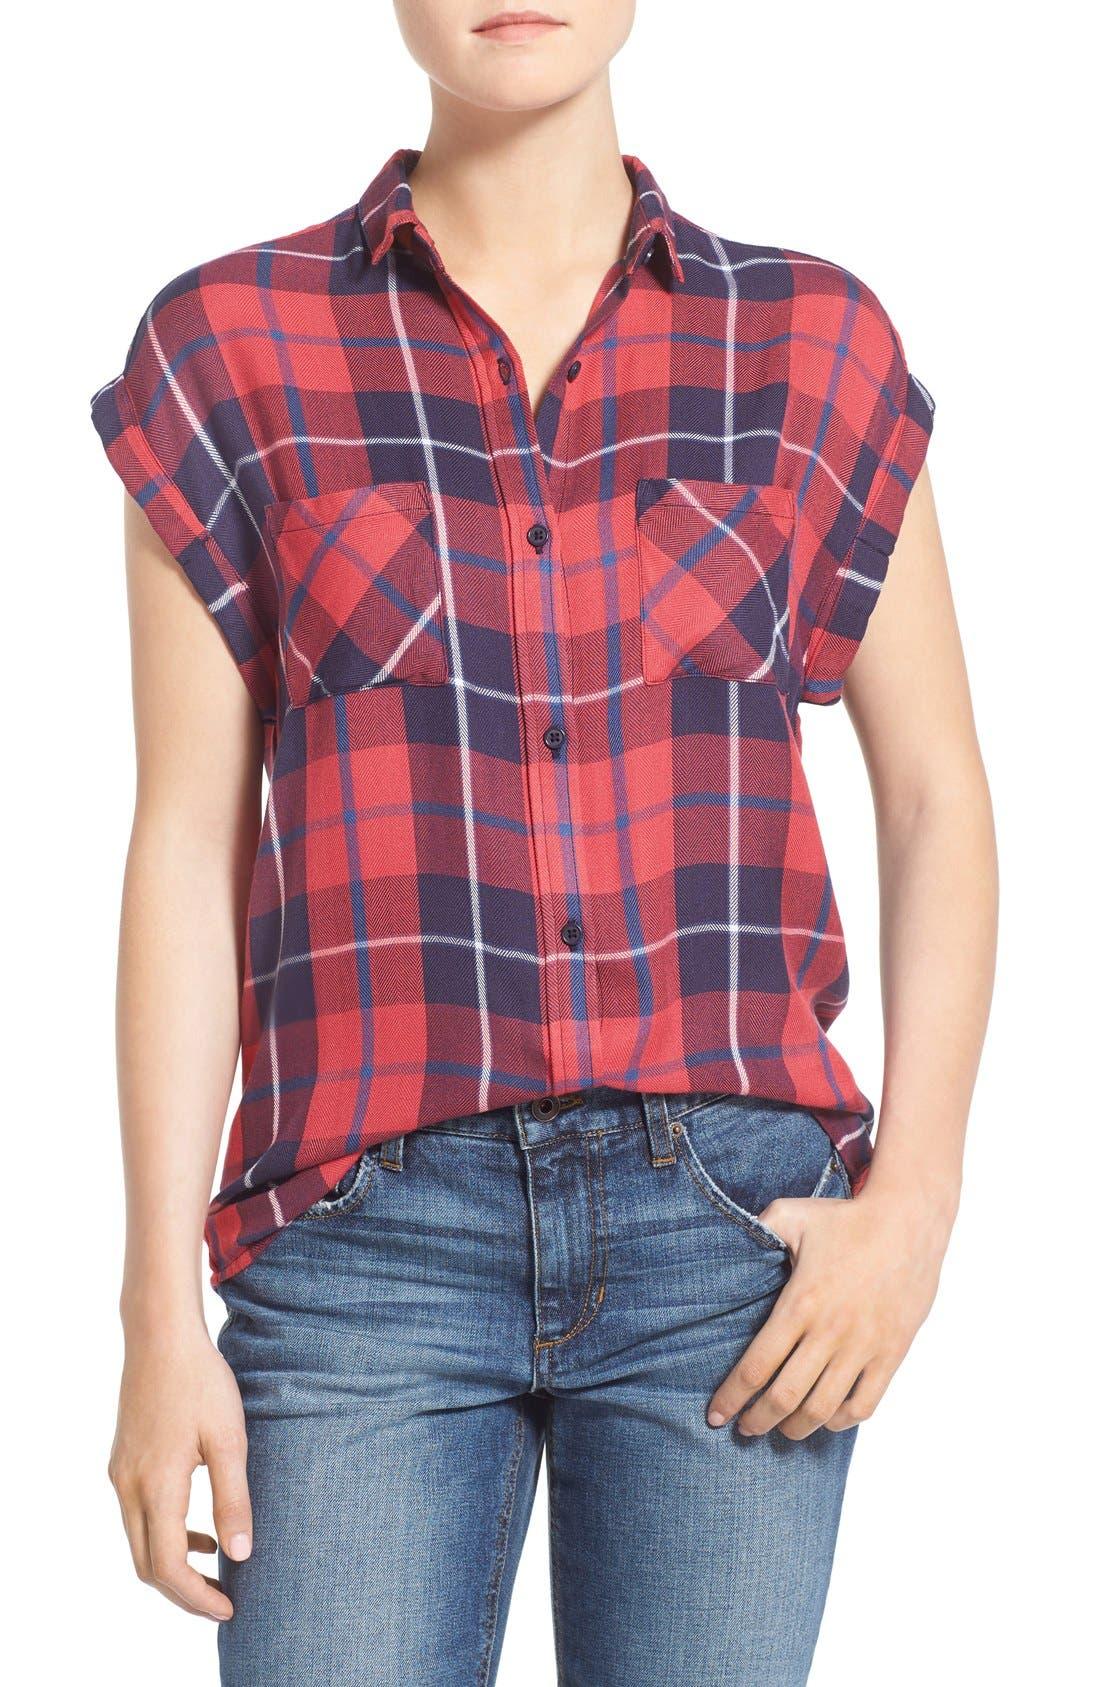 Alternate Image 1 Selected - Rails Plaid Cap Sleeve Shirt